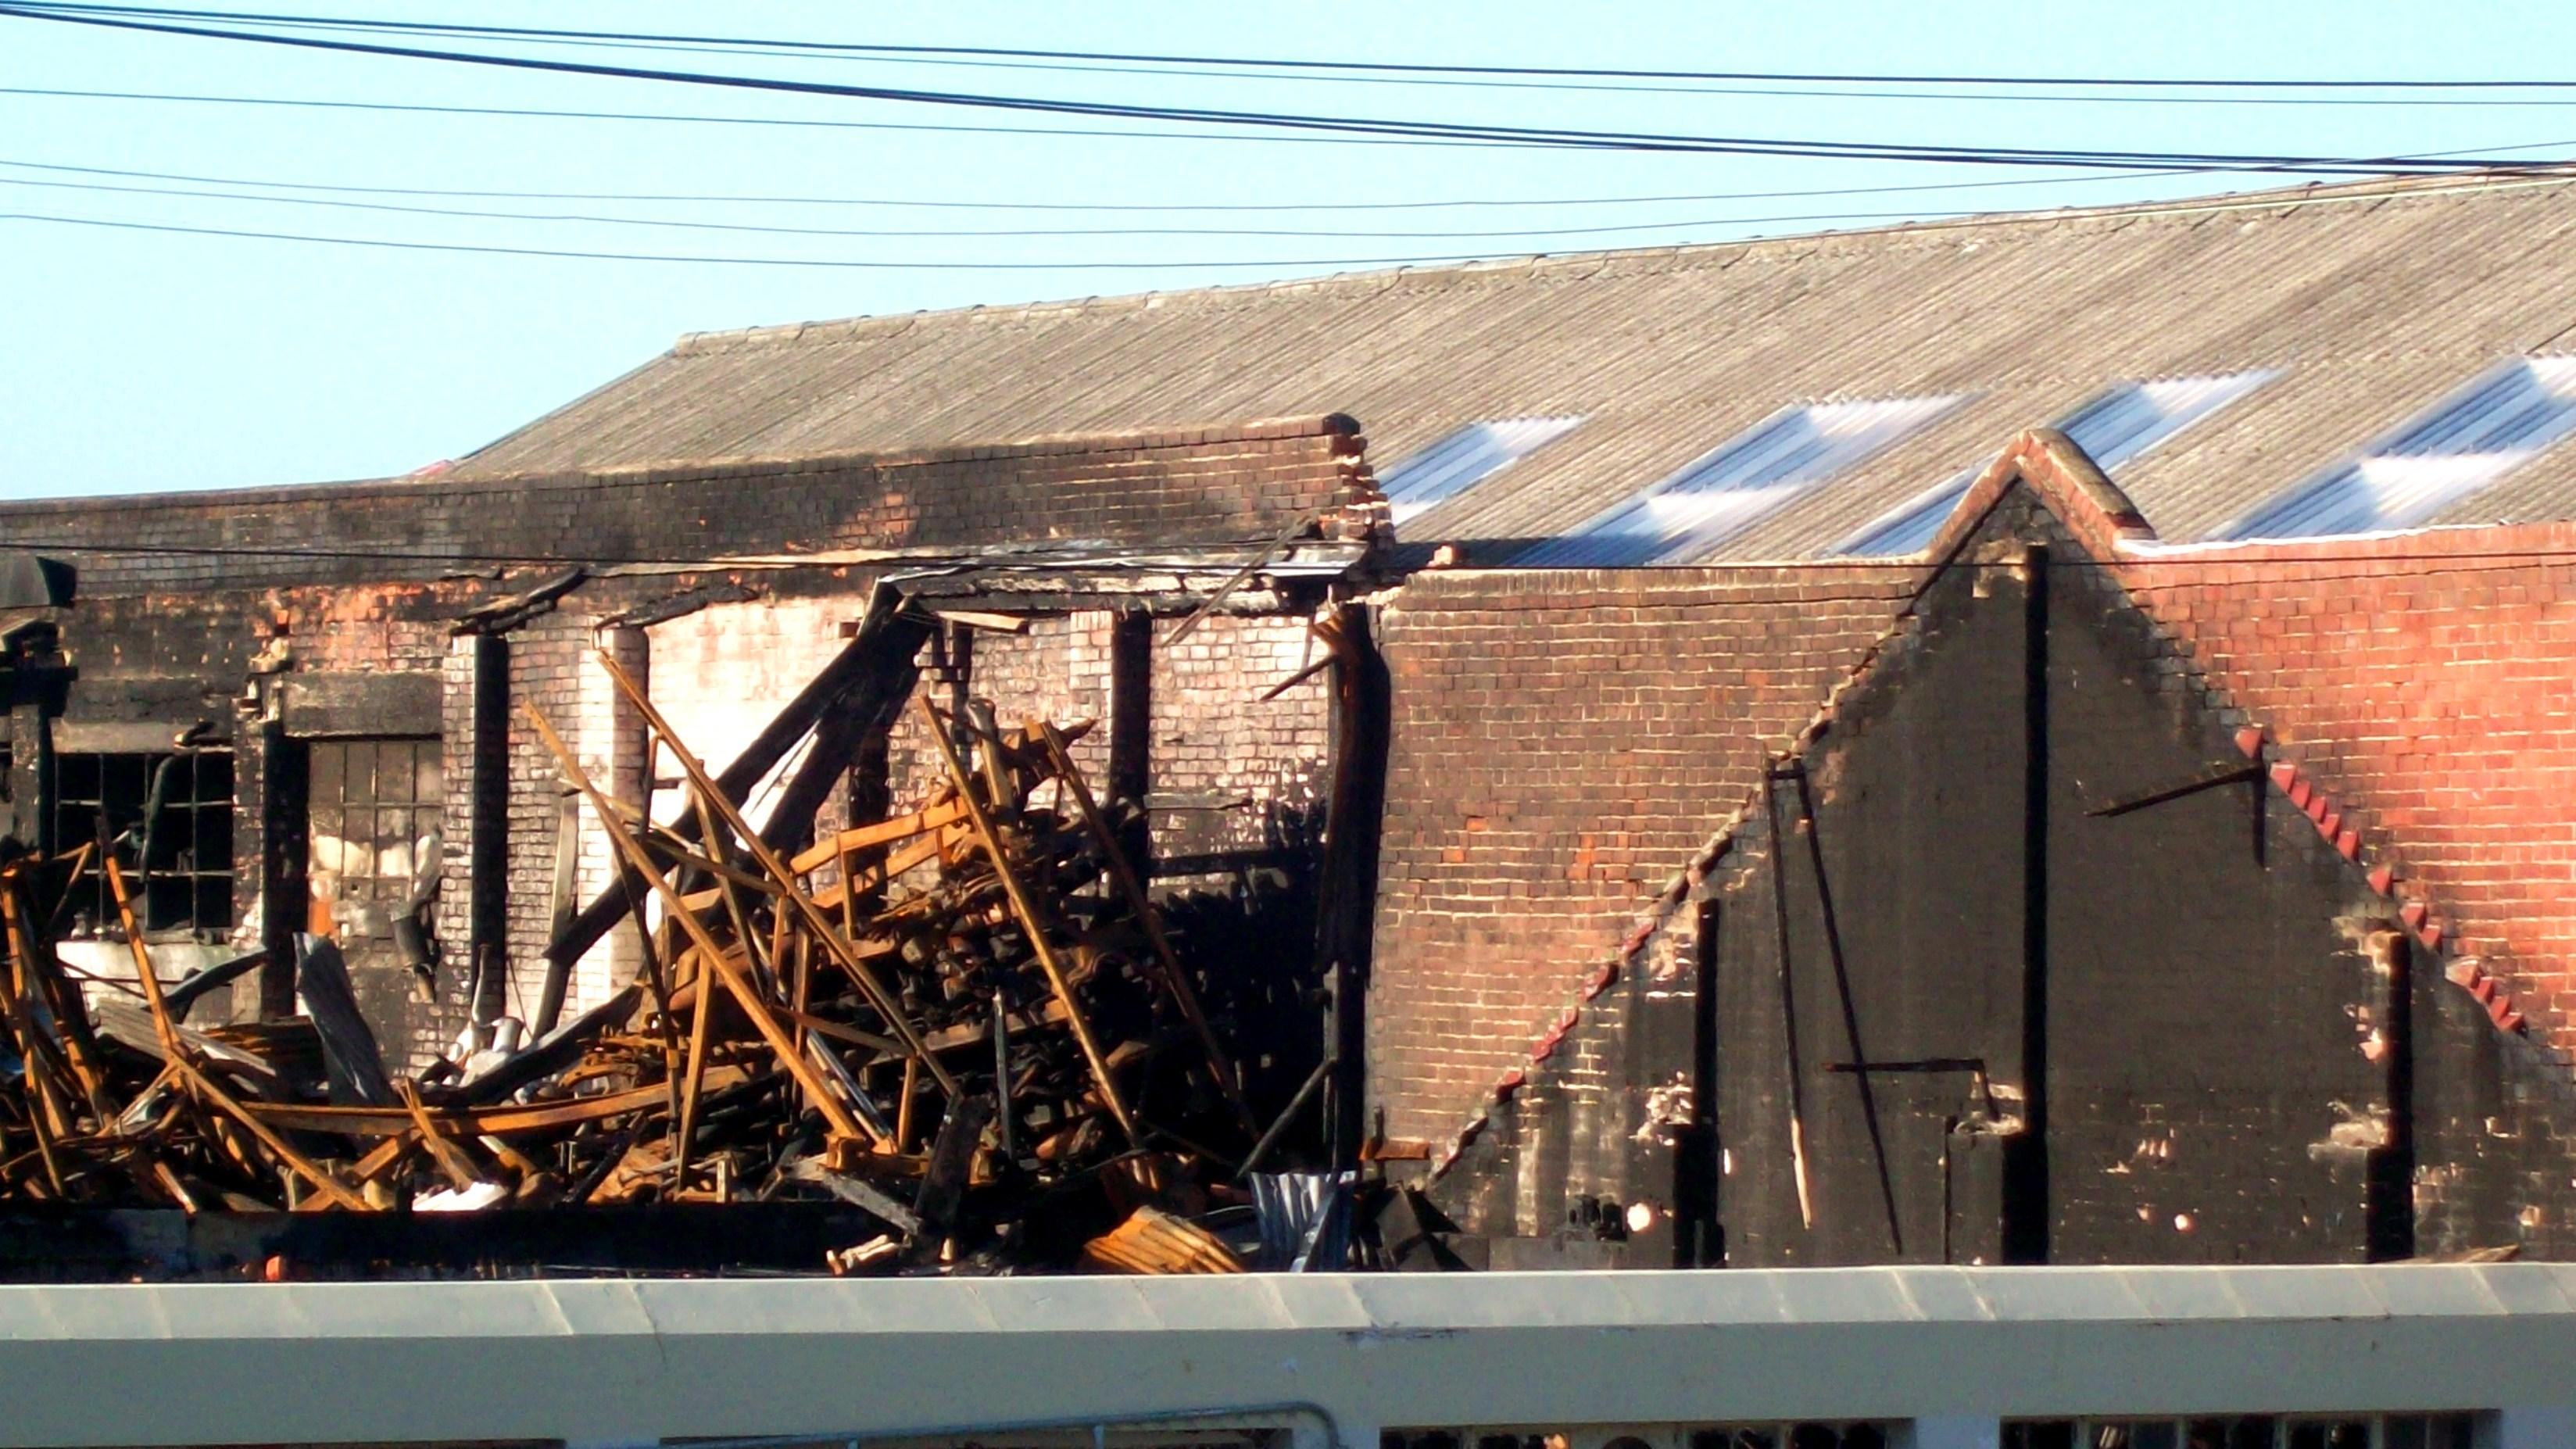 Twisted Metal, Insurance, Street, Sky, Rust, HQ Photo